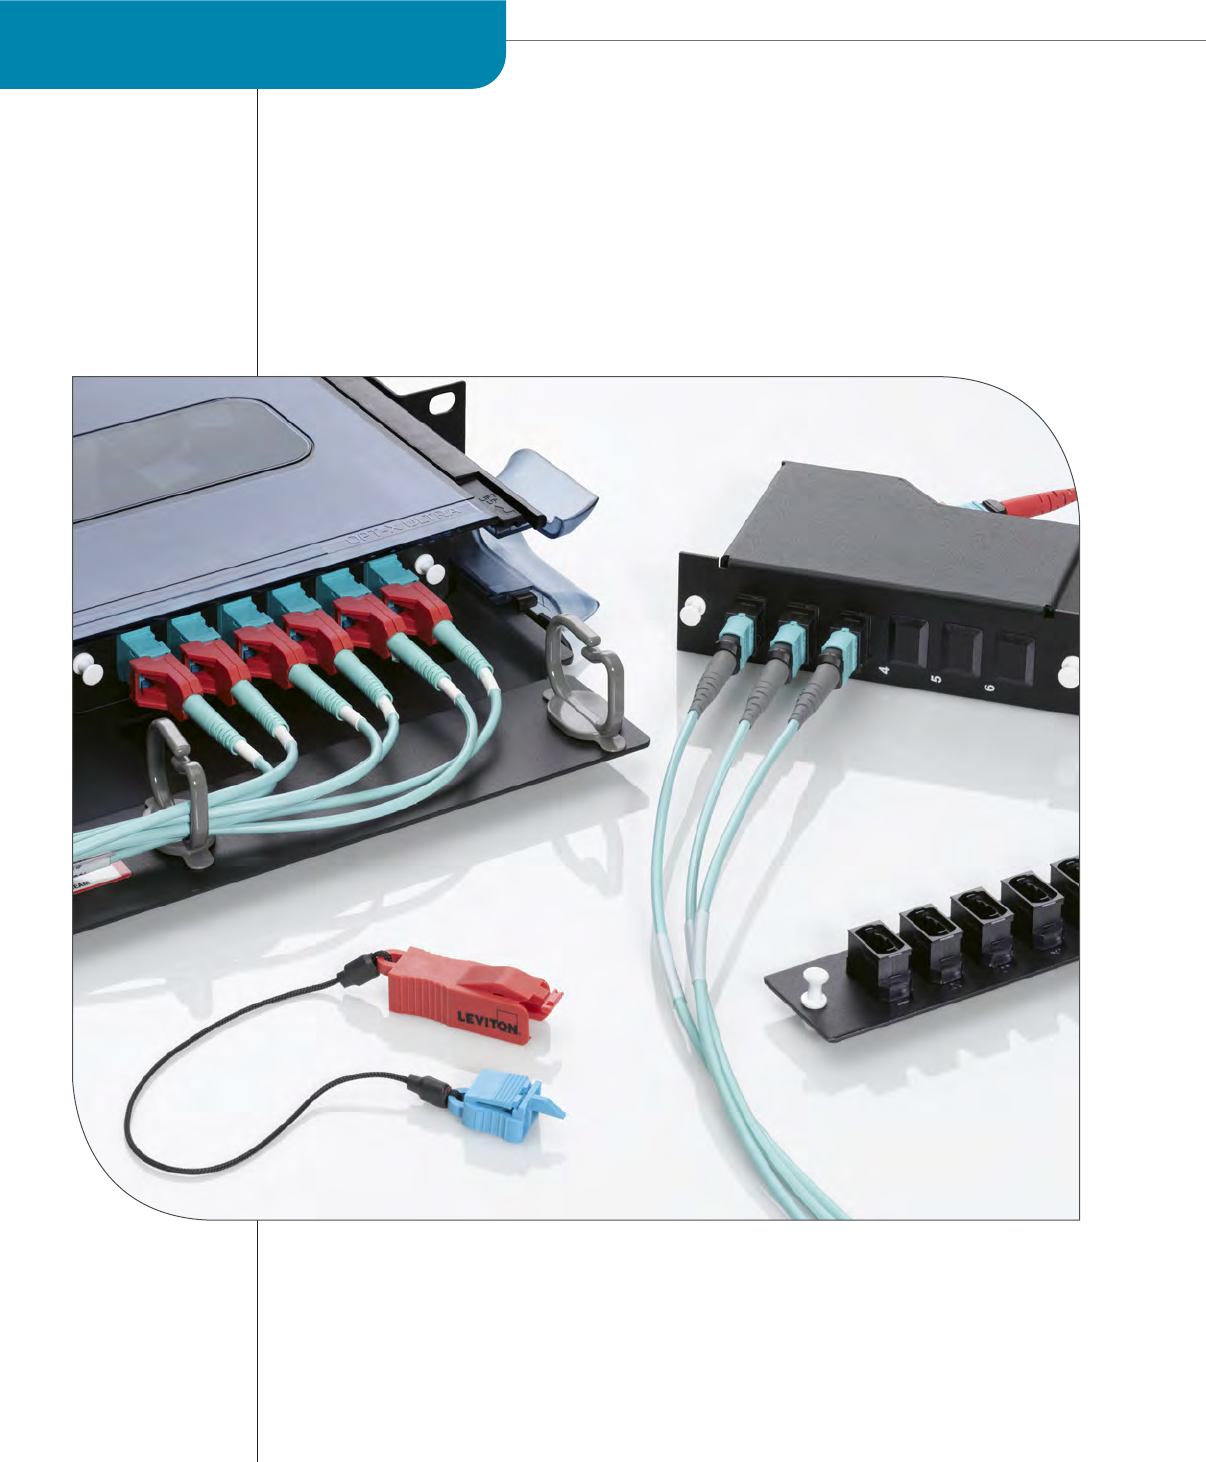 SC APC 12 Count to Open Stub Fiber Optic Pigtails Singlemode 16 Meters